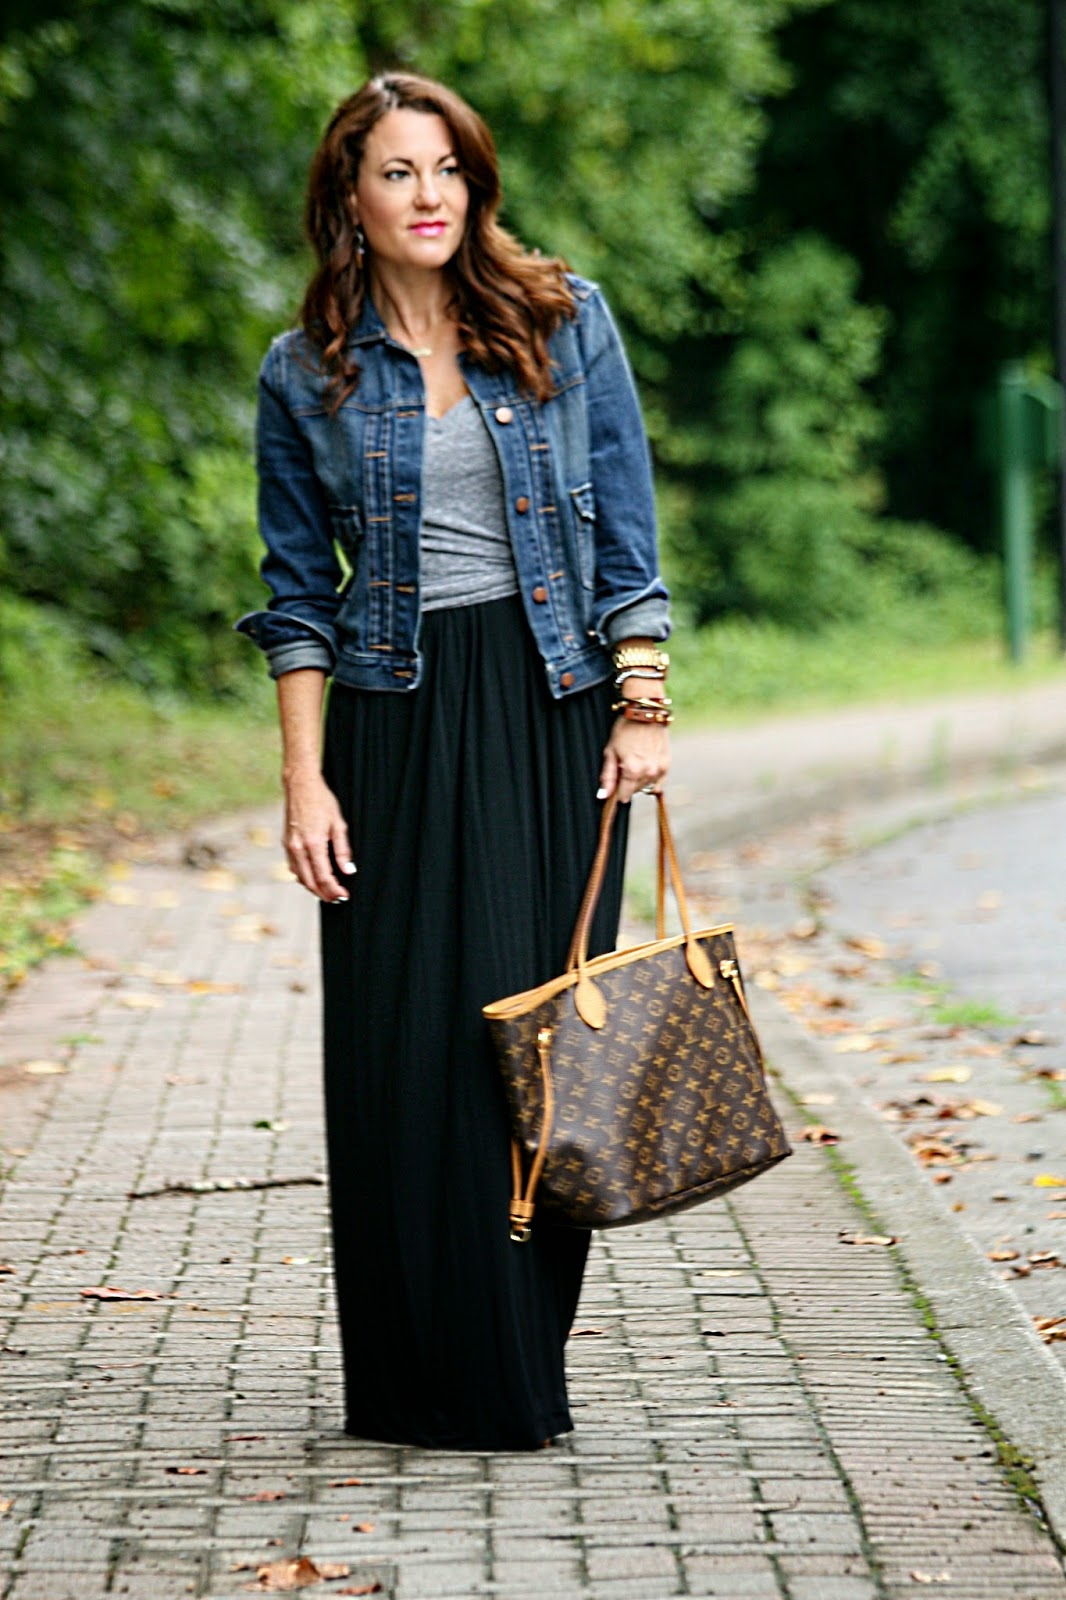 Jean jacket over maxi dress